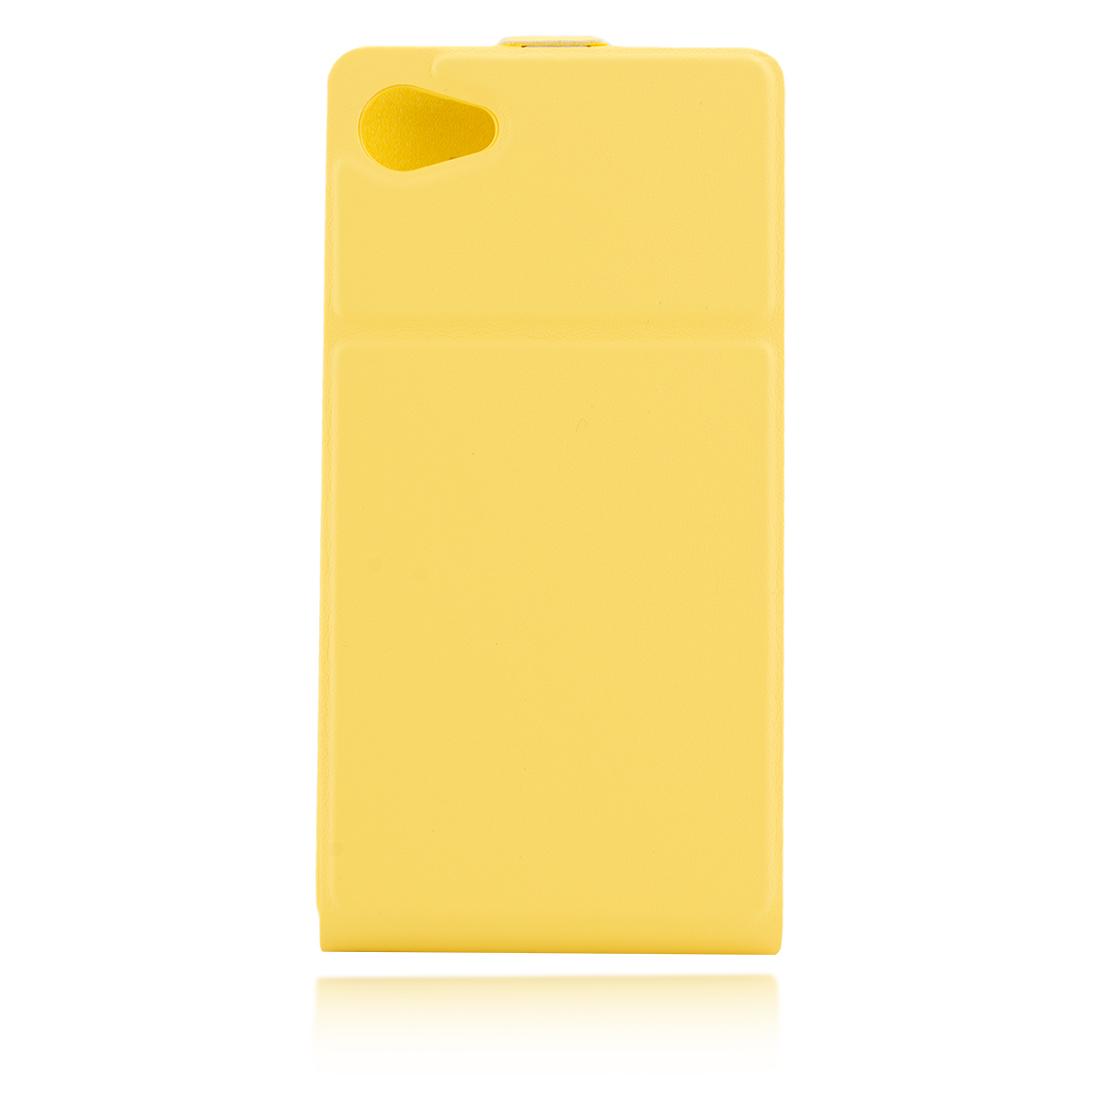 Флиппер жёлтый для Xperia Z5 Compact в Sony Centre Воронеж